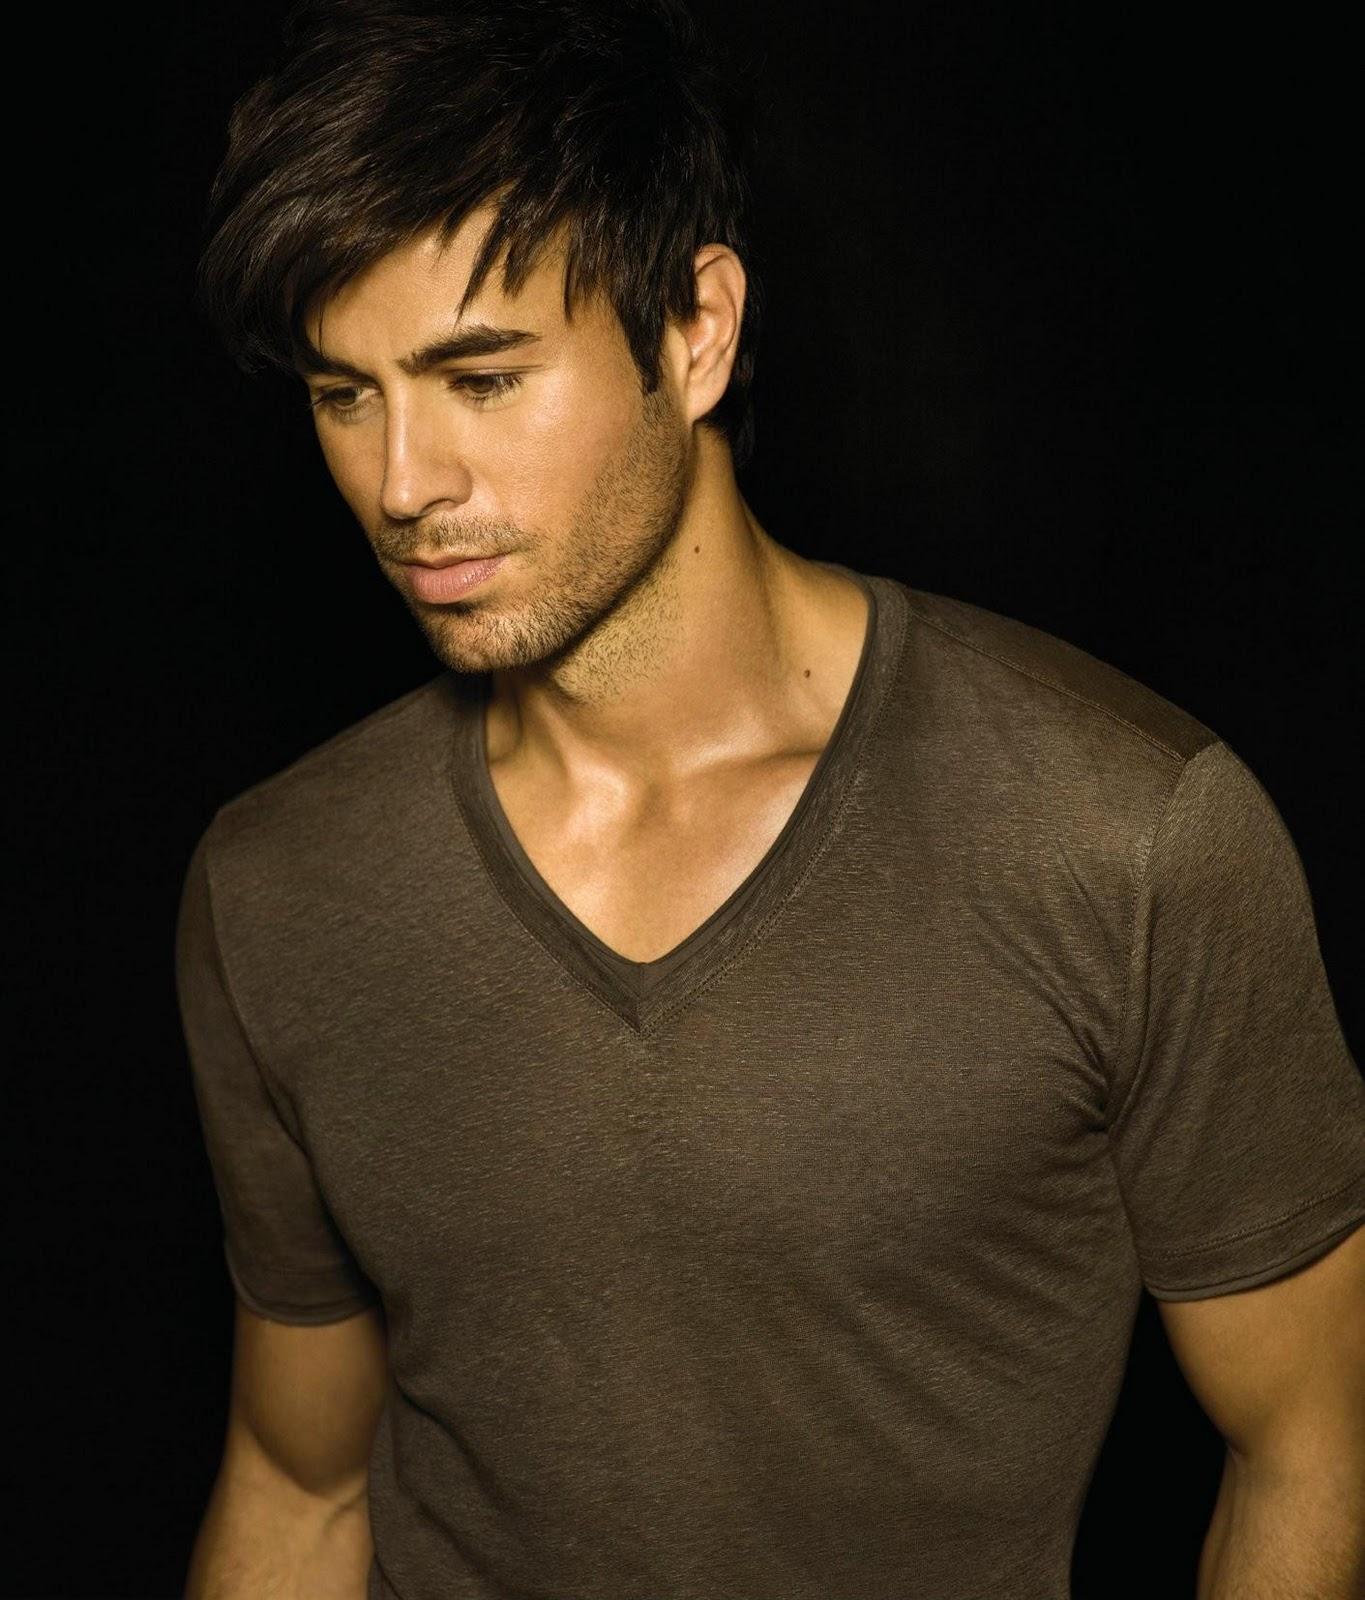 http://3.bp.blogspot.com/_lIyFl0bgYNU/TVLUwtcZMjI/AAAAAAAAAik/U1lhTNkCabQ/s1600/Enrique+40.jpg